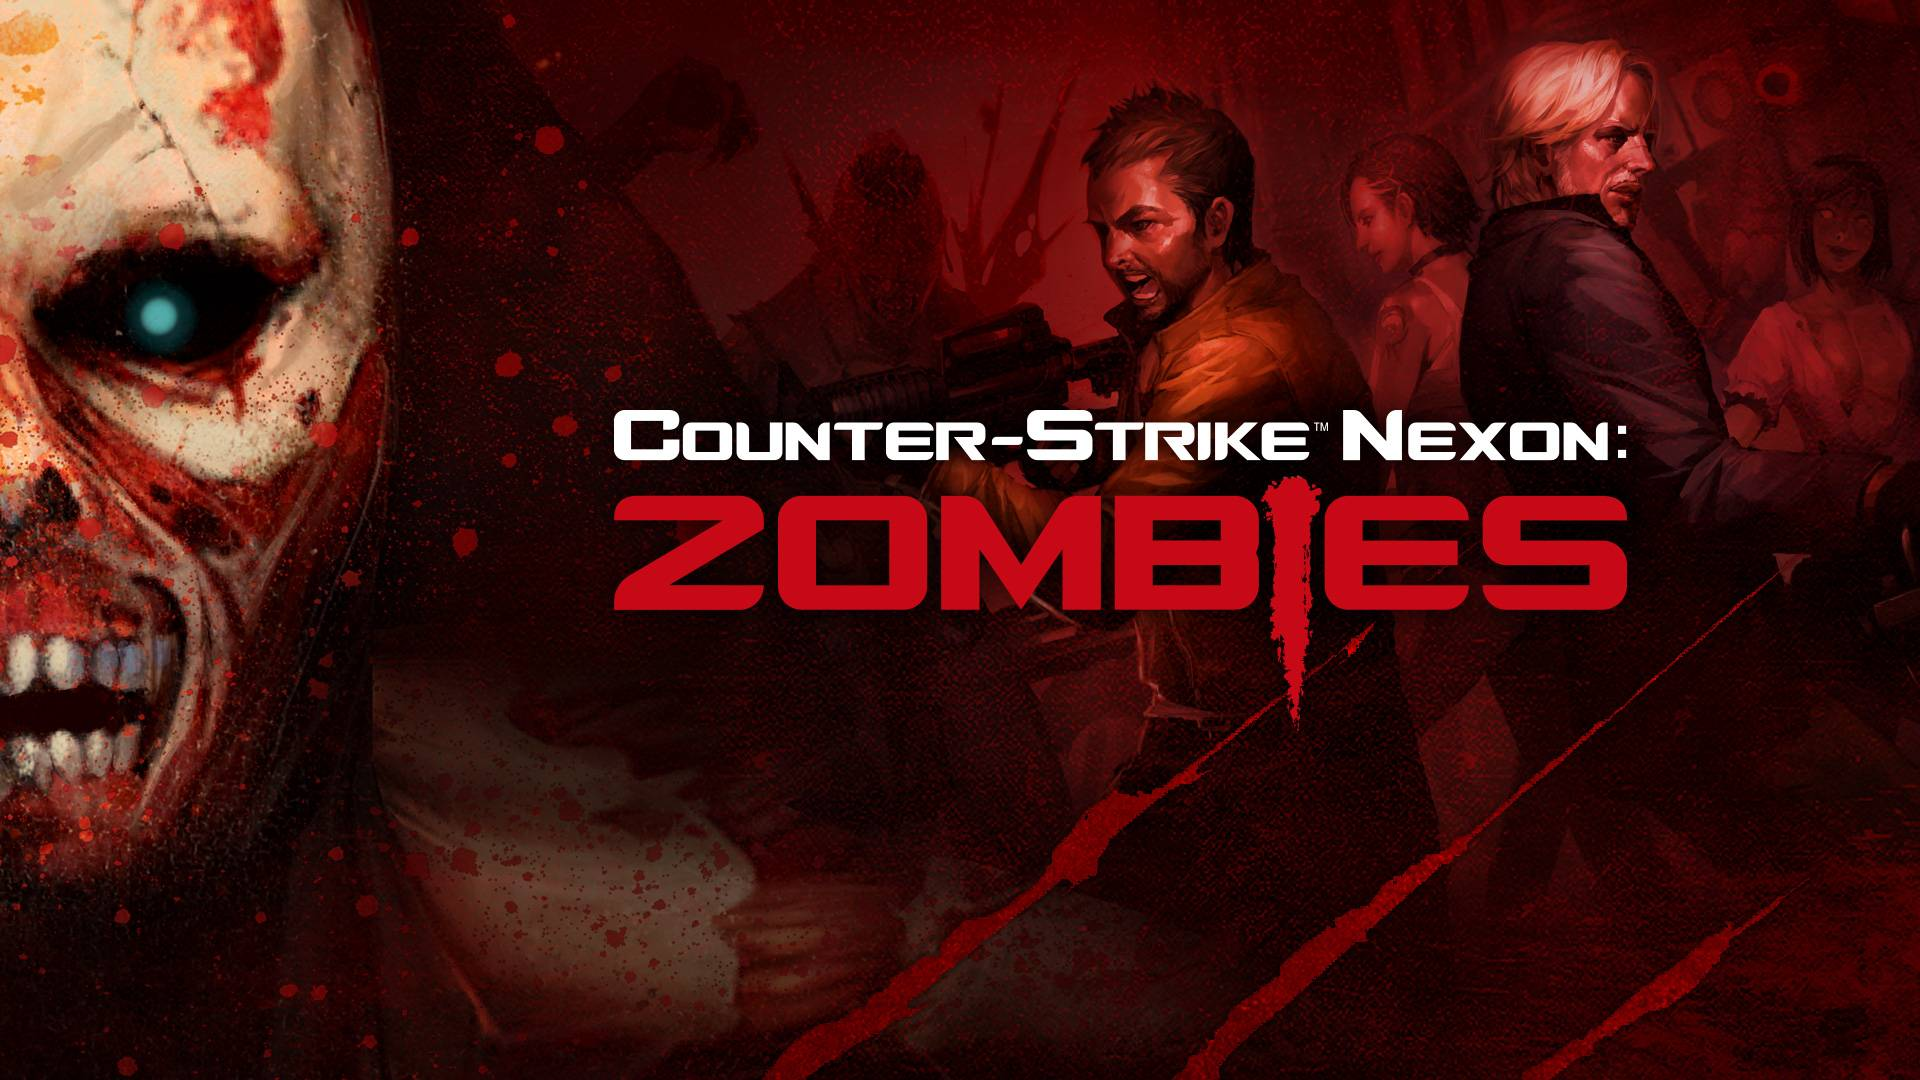 Counter-Strike Nexon: Zombies Wallpapers